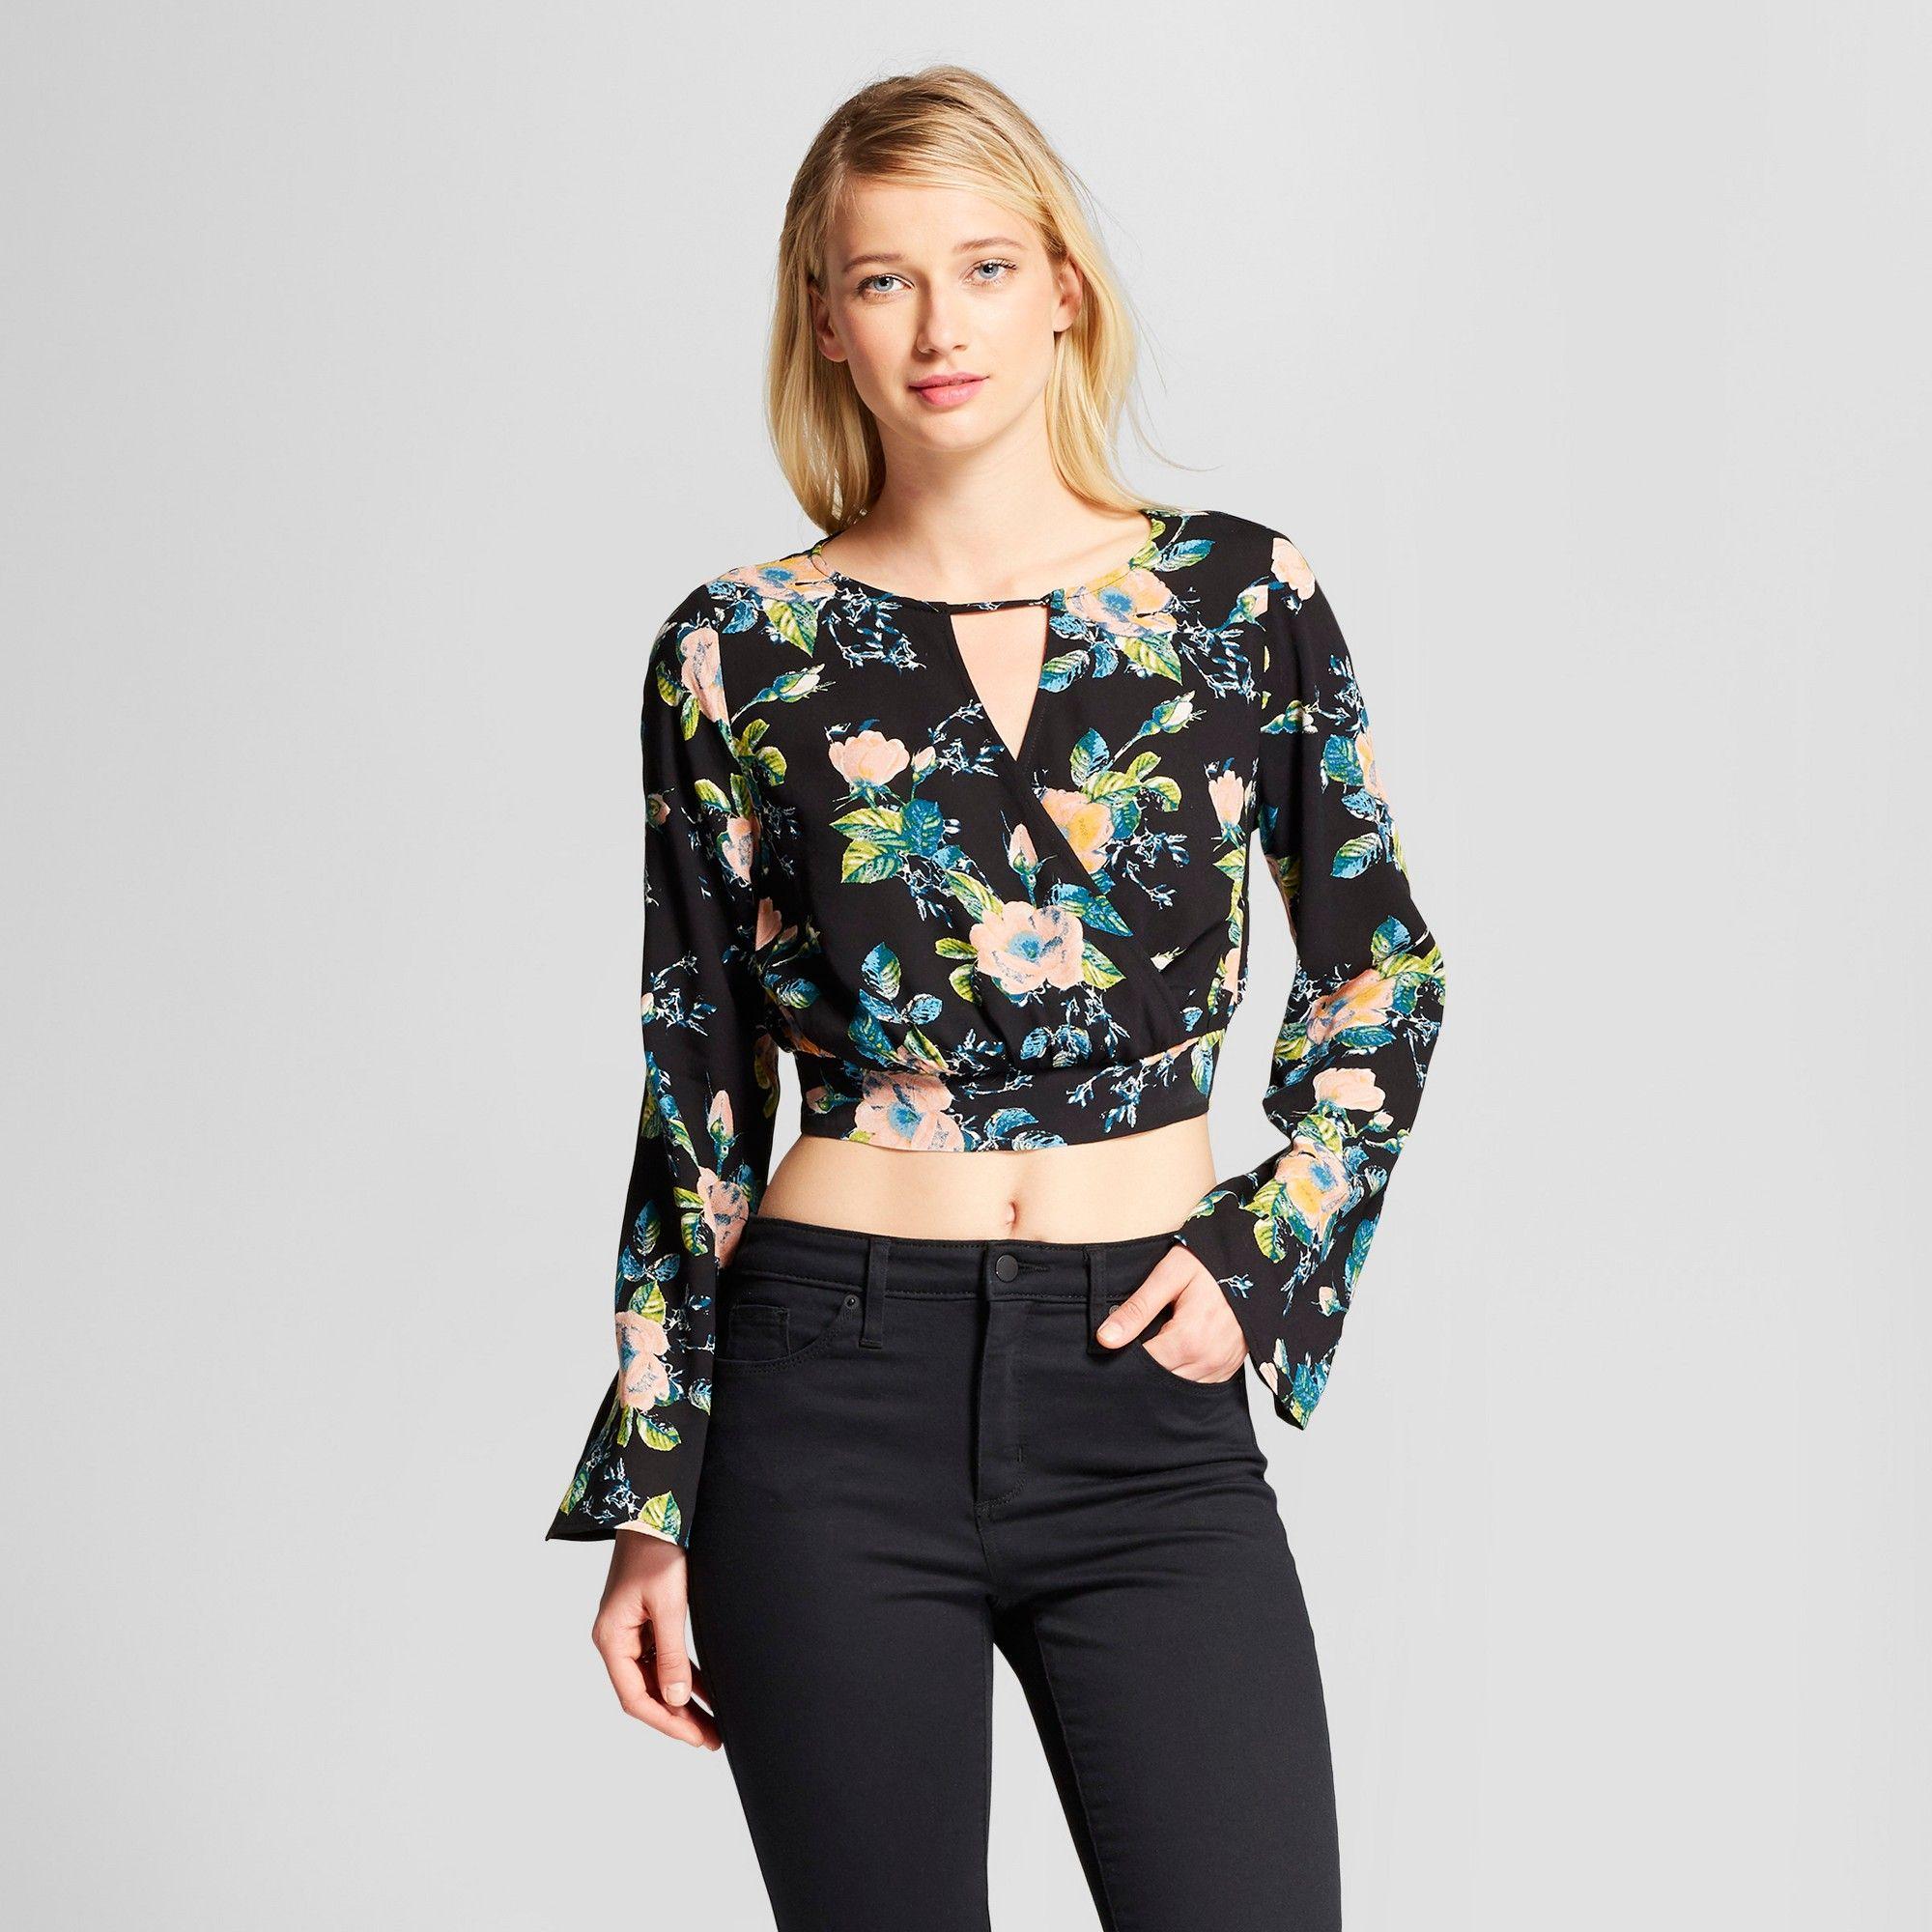 239bc12ddaaeb Women s Floral Print Long Sleeve Wrap Bell Sleeve Crop Top - Xhilaration  Black S